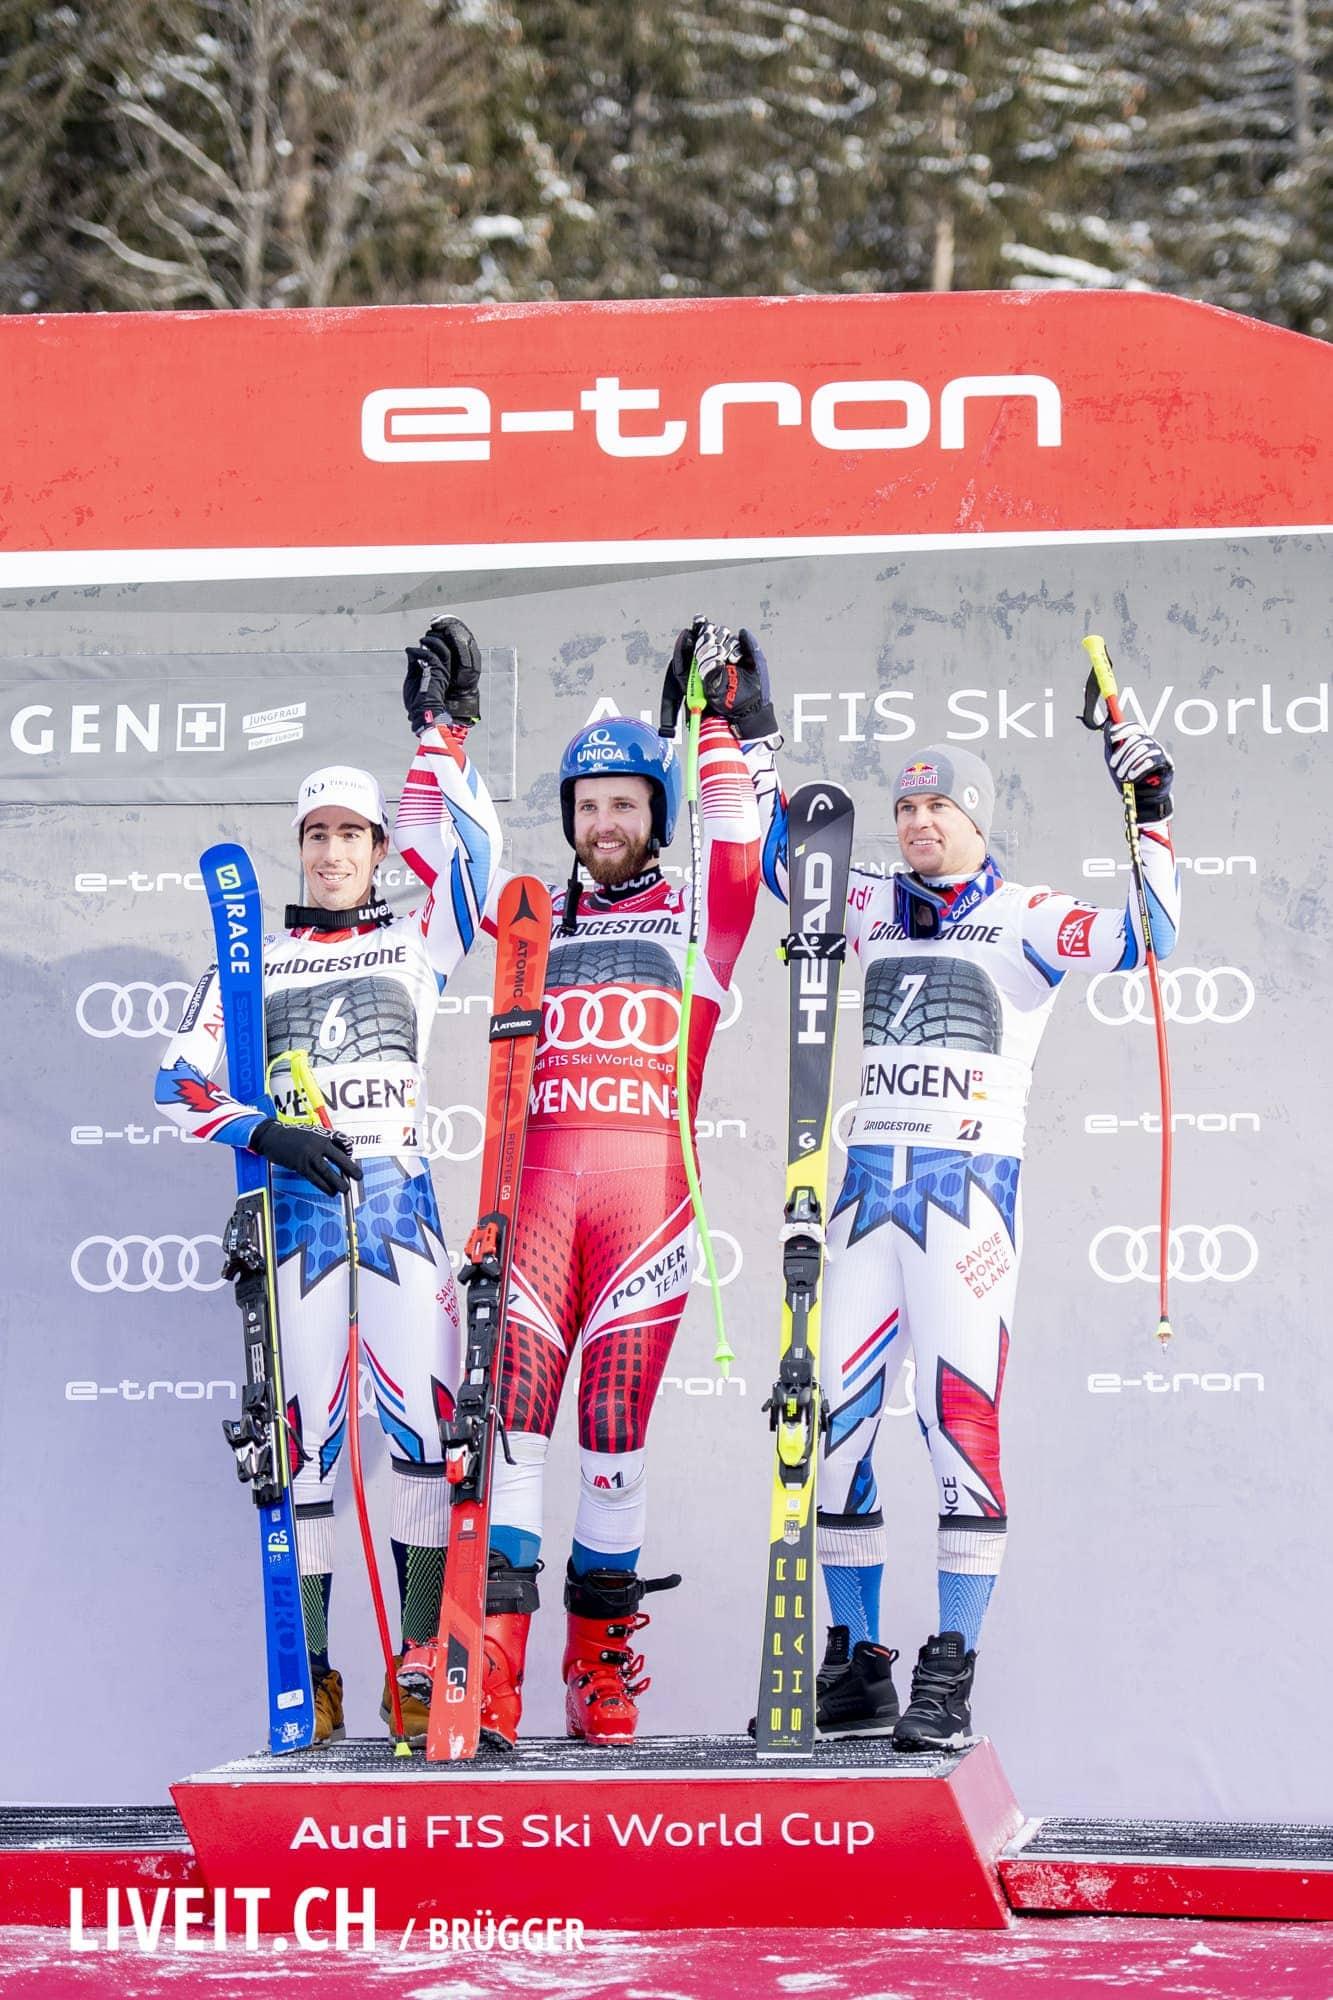 Siegerpodium fotografiert am Freitag, 18. Januar 2019 am Lauberhornrennen in der Disziplin: Slalom Alpine Kombination. 1. Marco Schwarz (AUT), 2. Victor Muffat-Jeandet (FRA), 3. Alexis Pinturault (FRA)(Fotografiert von Dominic Bruegger liveit.ch)